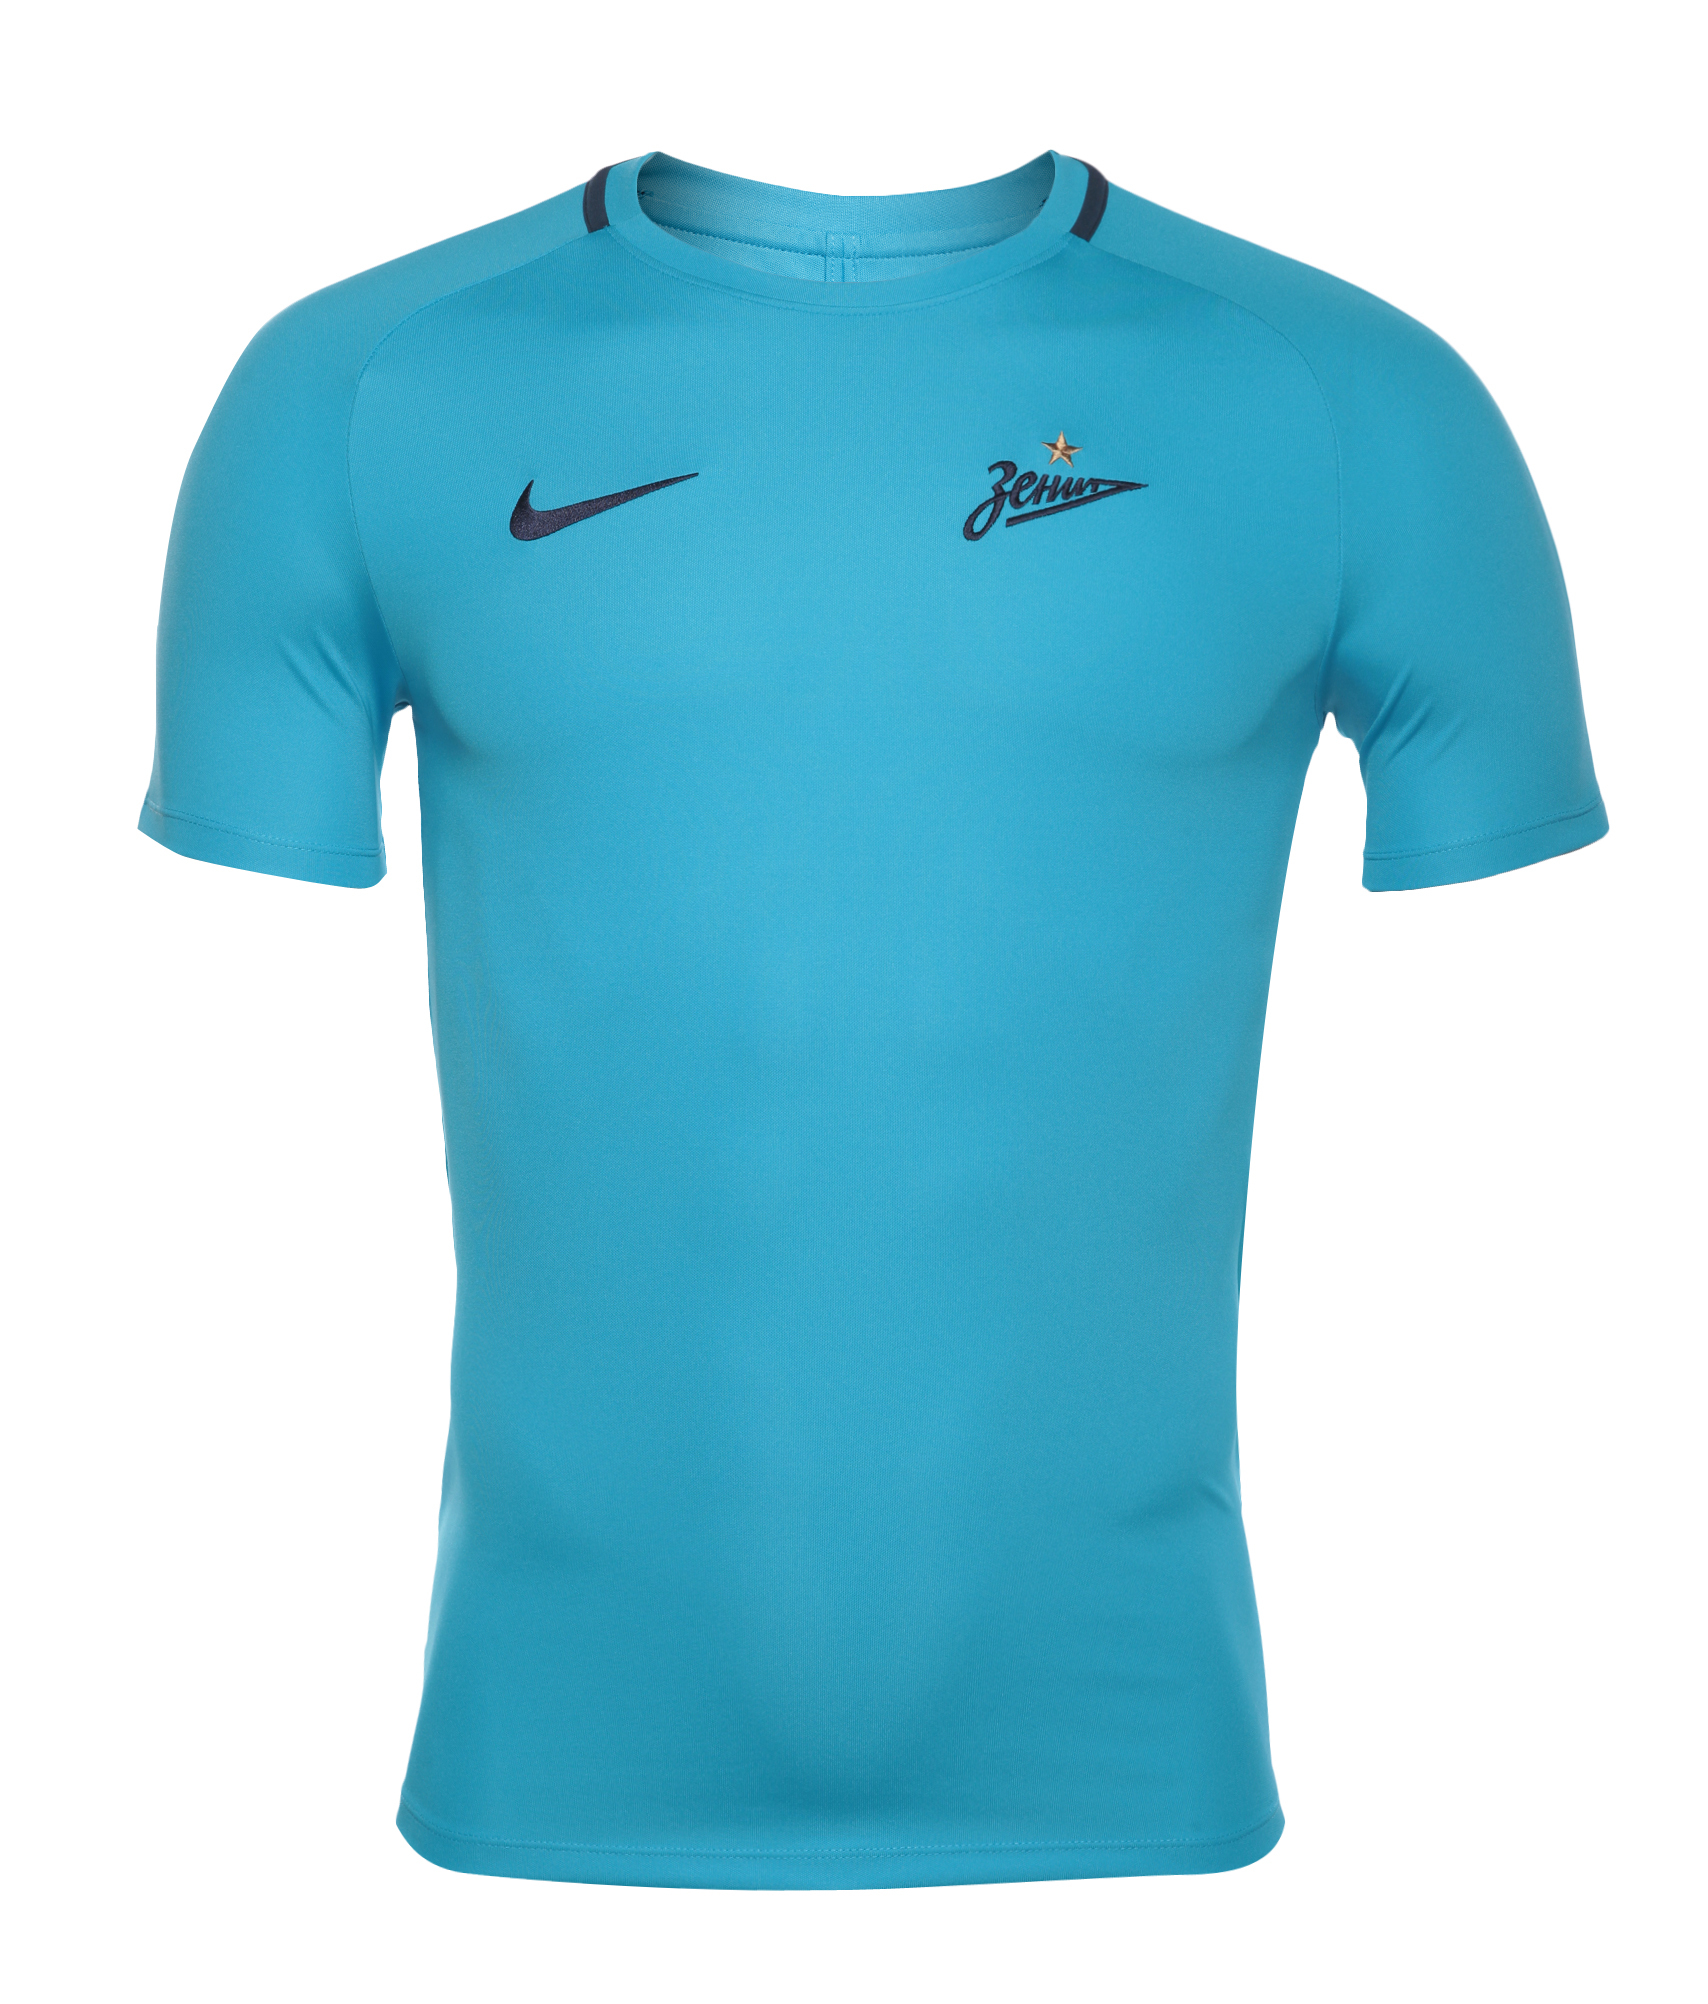 Футболка тренировочная Nike Nike Цвет-Синий футболка тренировочная подростковая nike размер xs